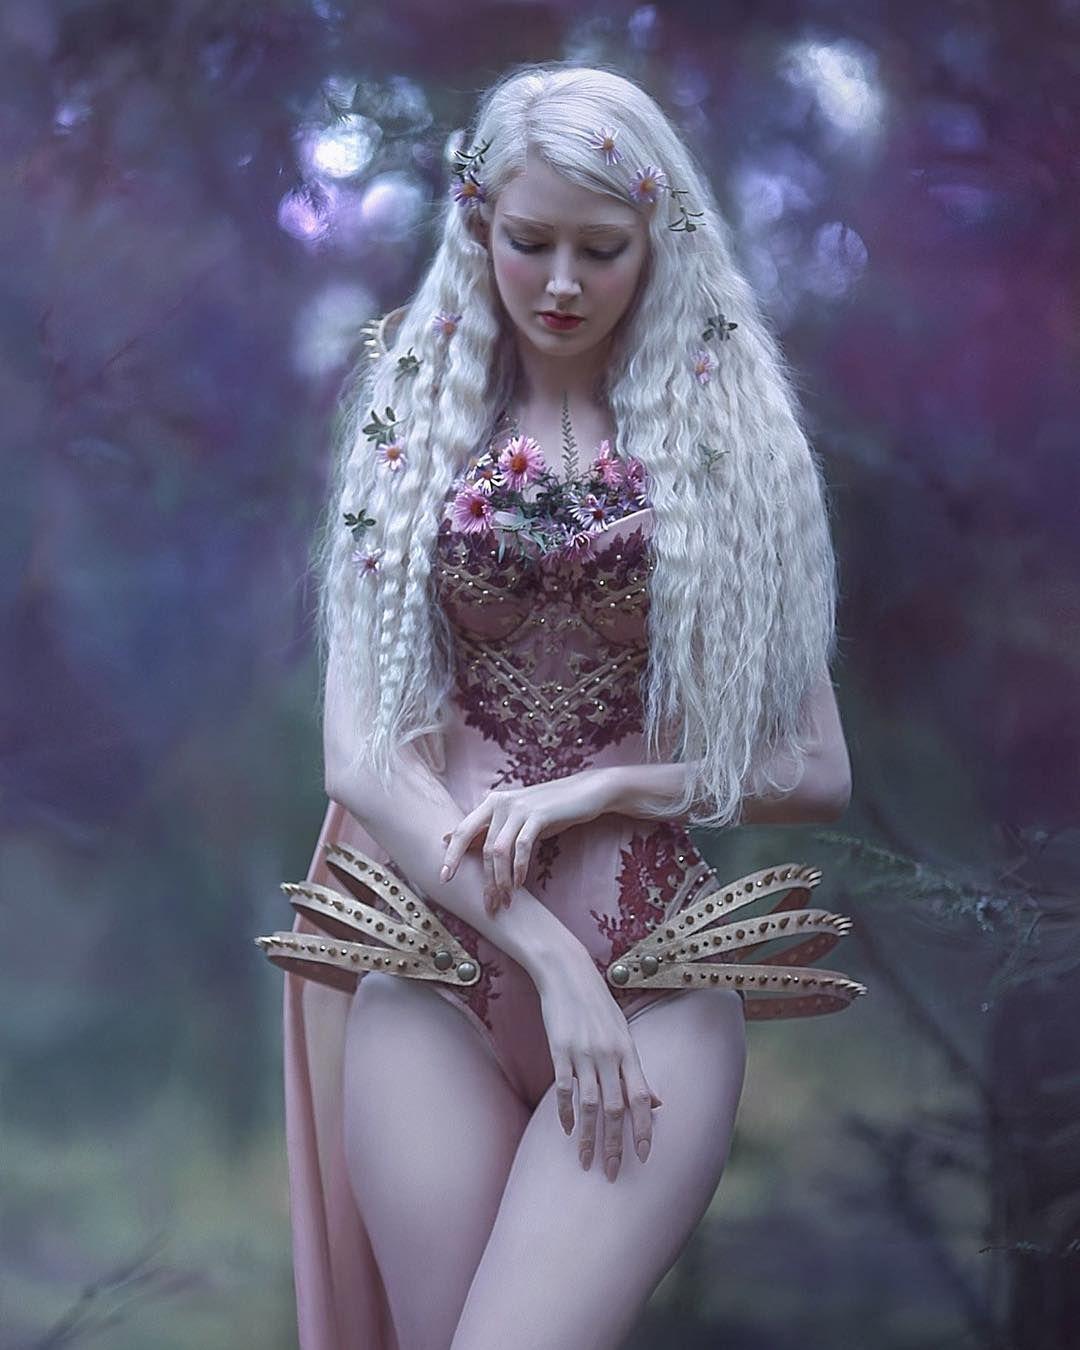 "A.M. Lorek Photography auf Instagram: ""# Rückfall von meinem Shooting mit @mariaamanda_official :) Kostüm @royalblack_couture #agnieszkalorek #digitalpainting #fantasy # fairy …"""